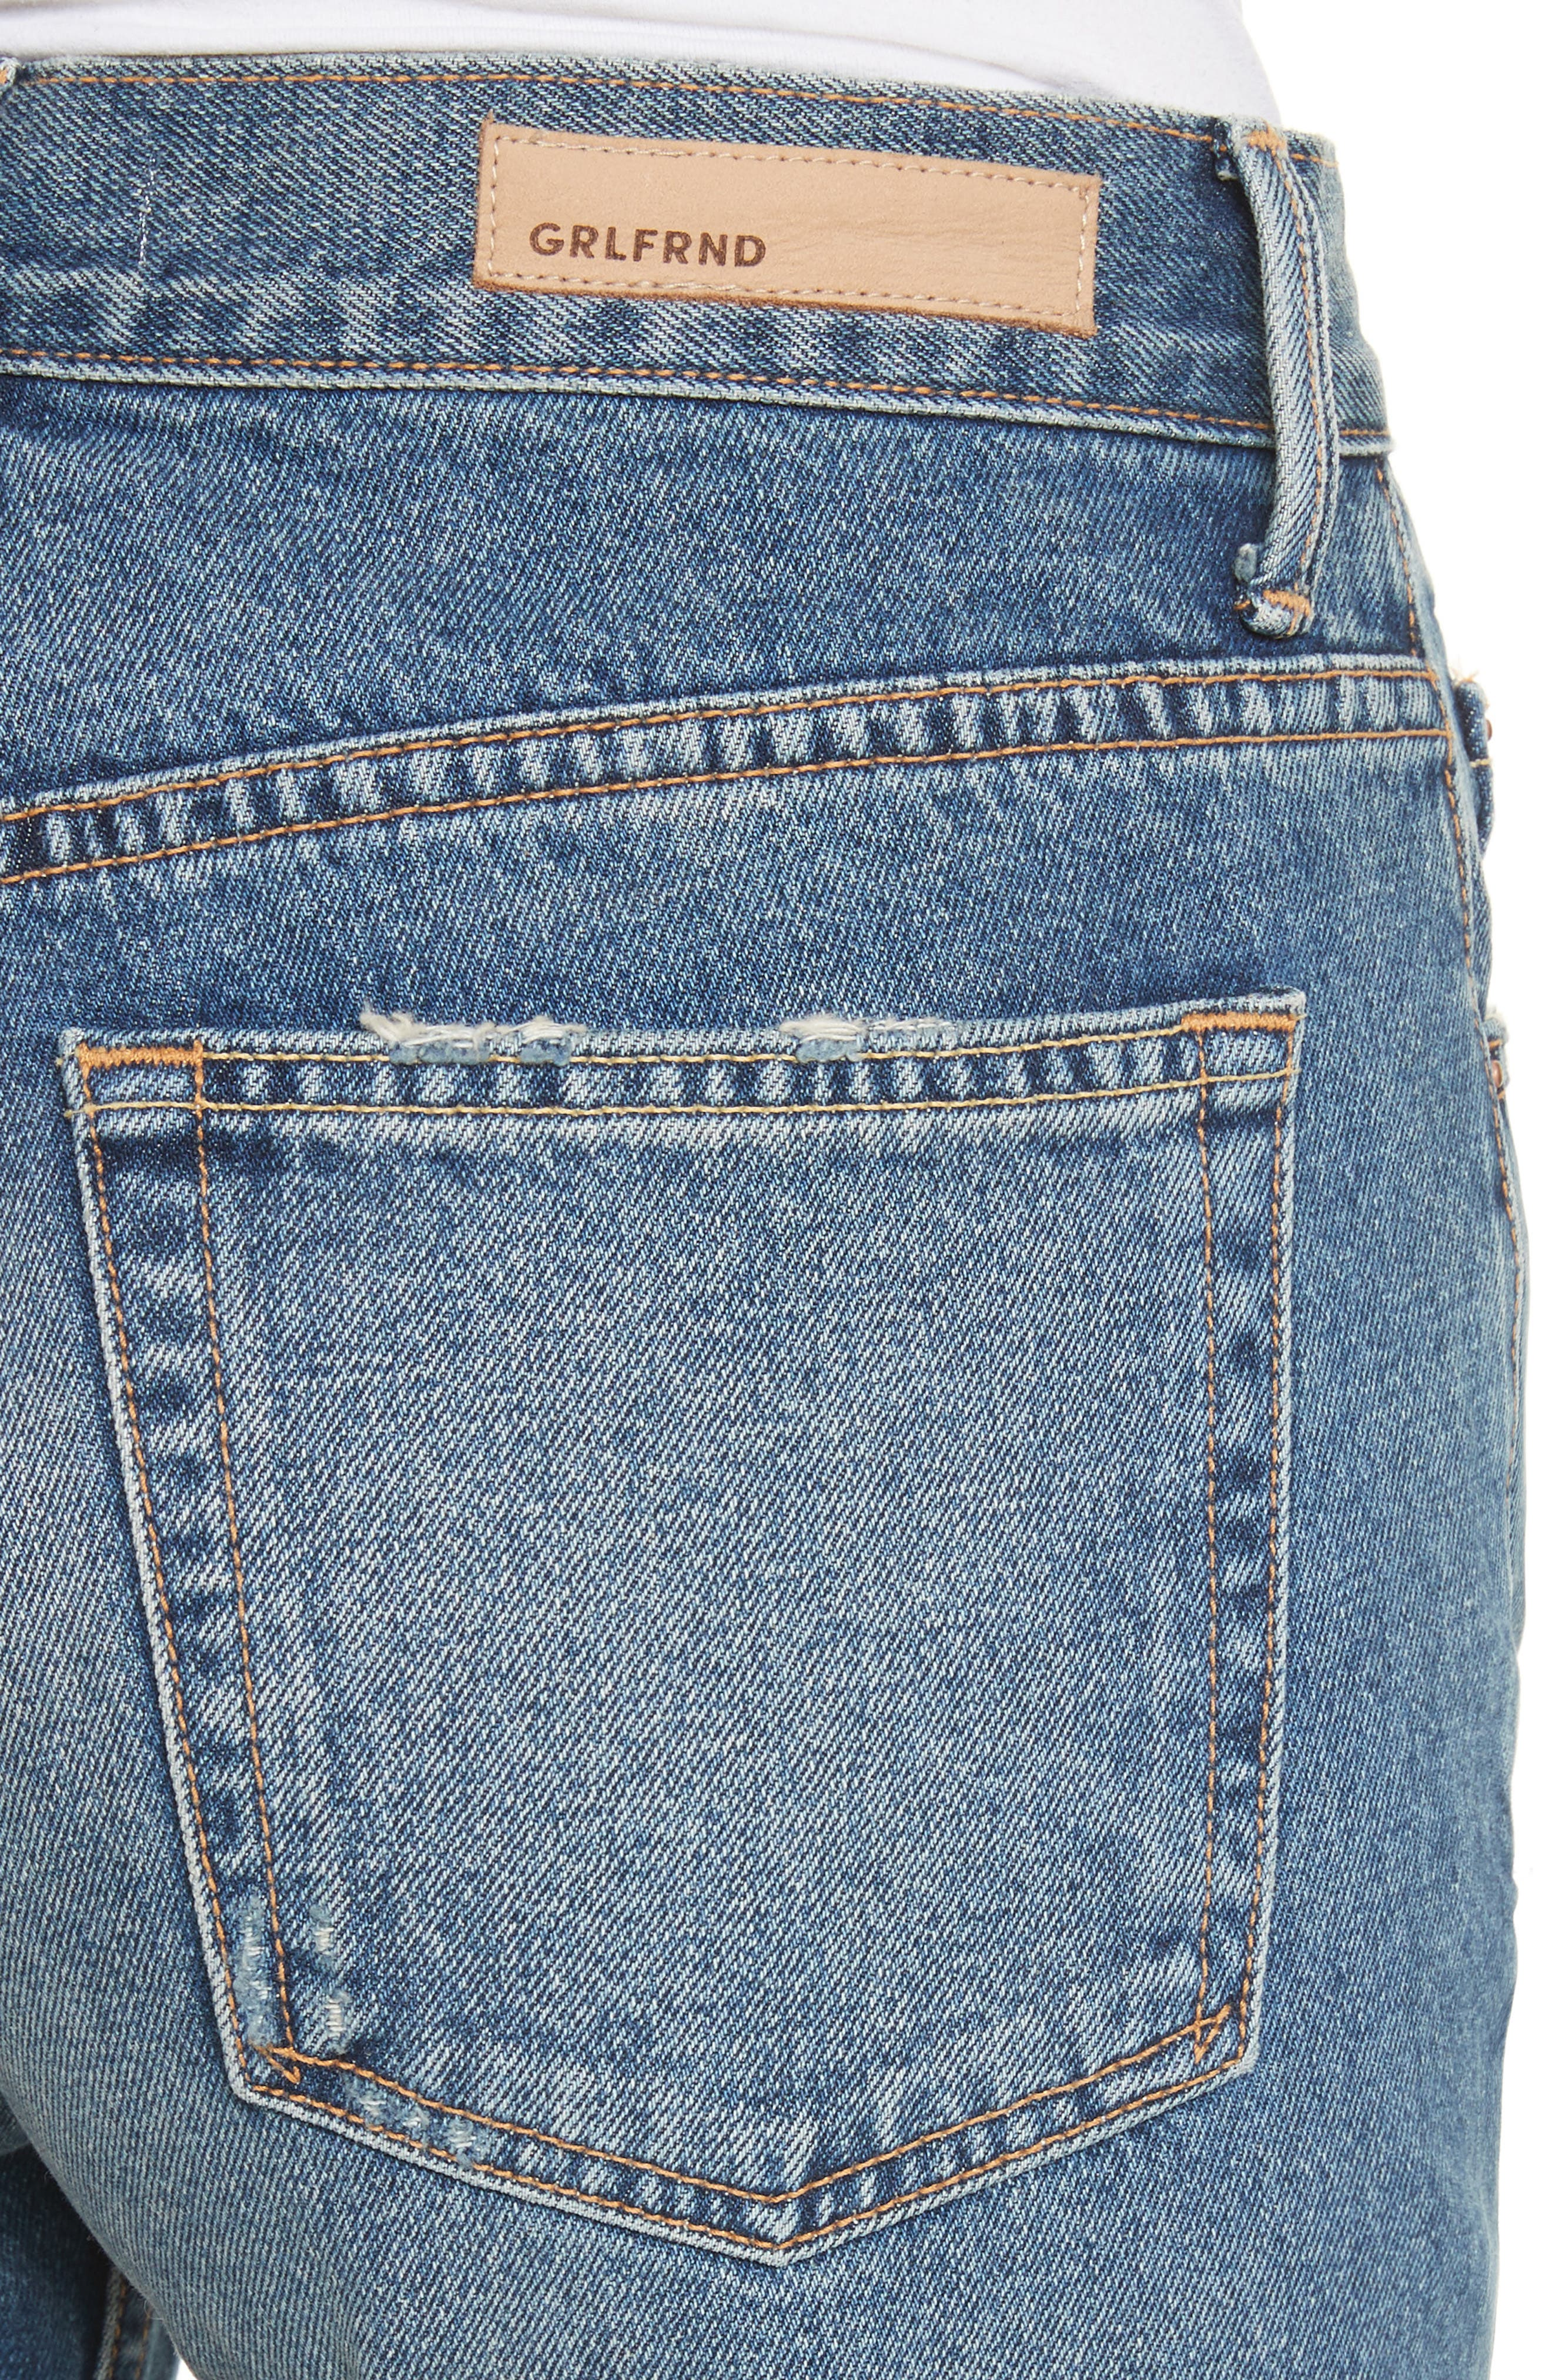 Linda Ripped Rigid High Waist Pop Crop Jeans,                             Alternate thumbnail 4, color,                             Zodiac